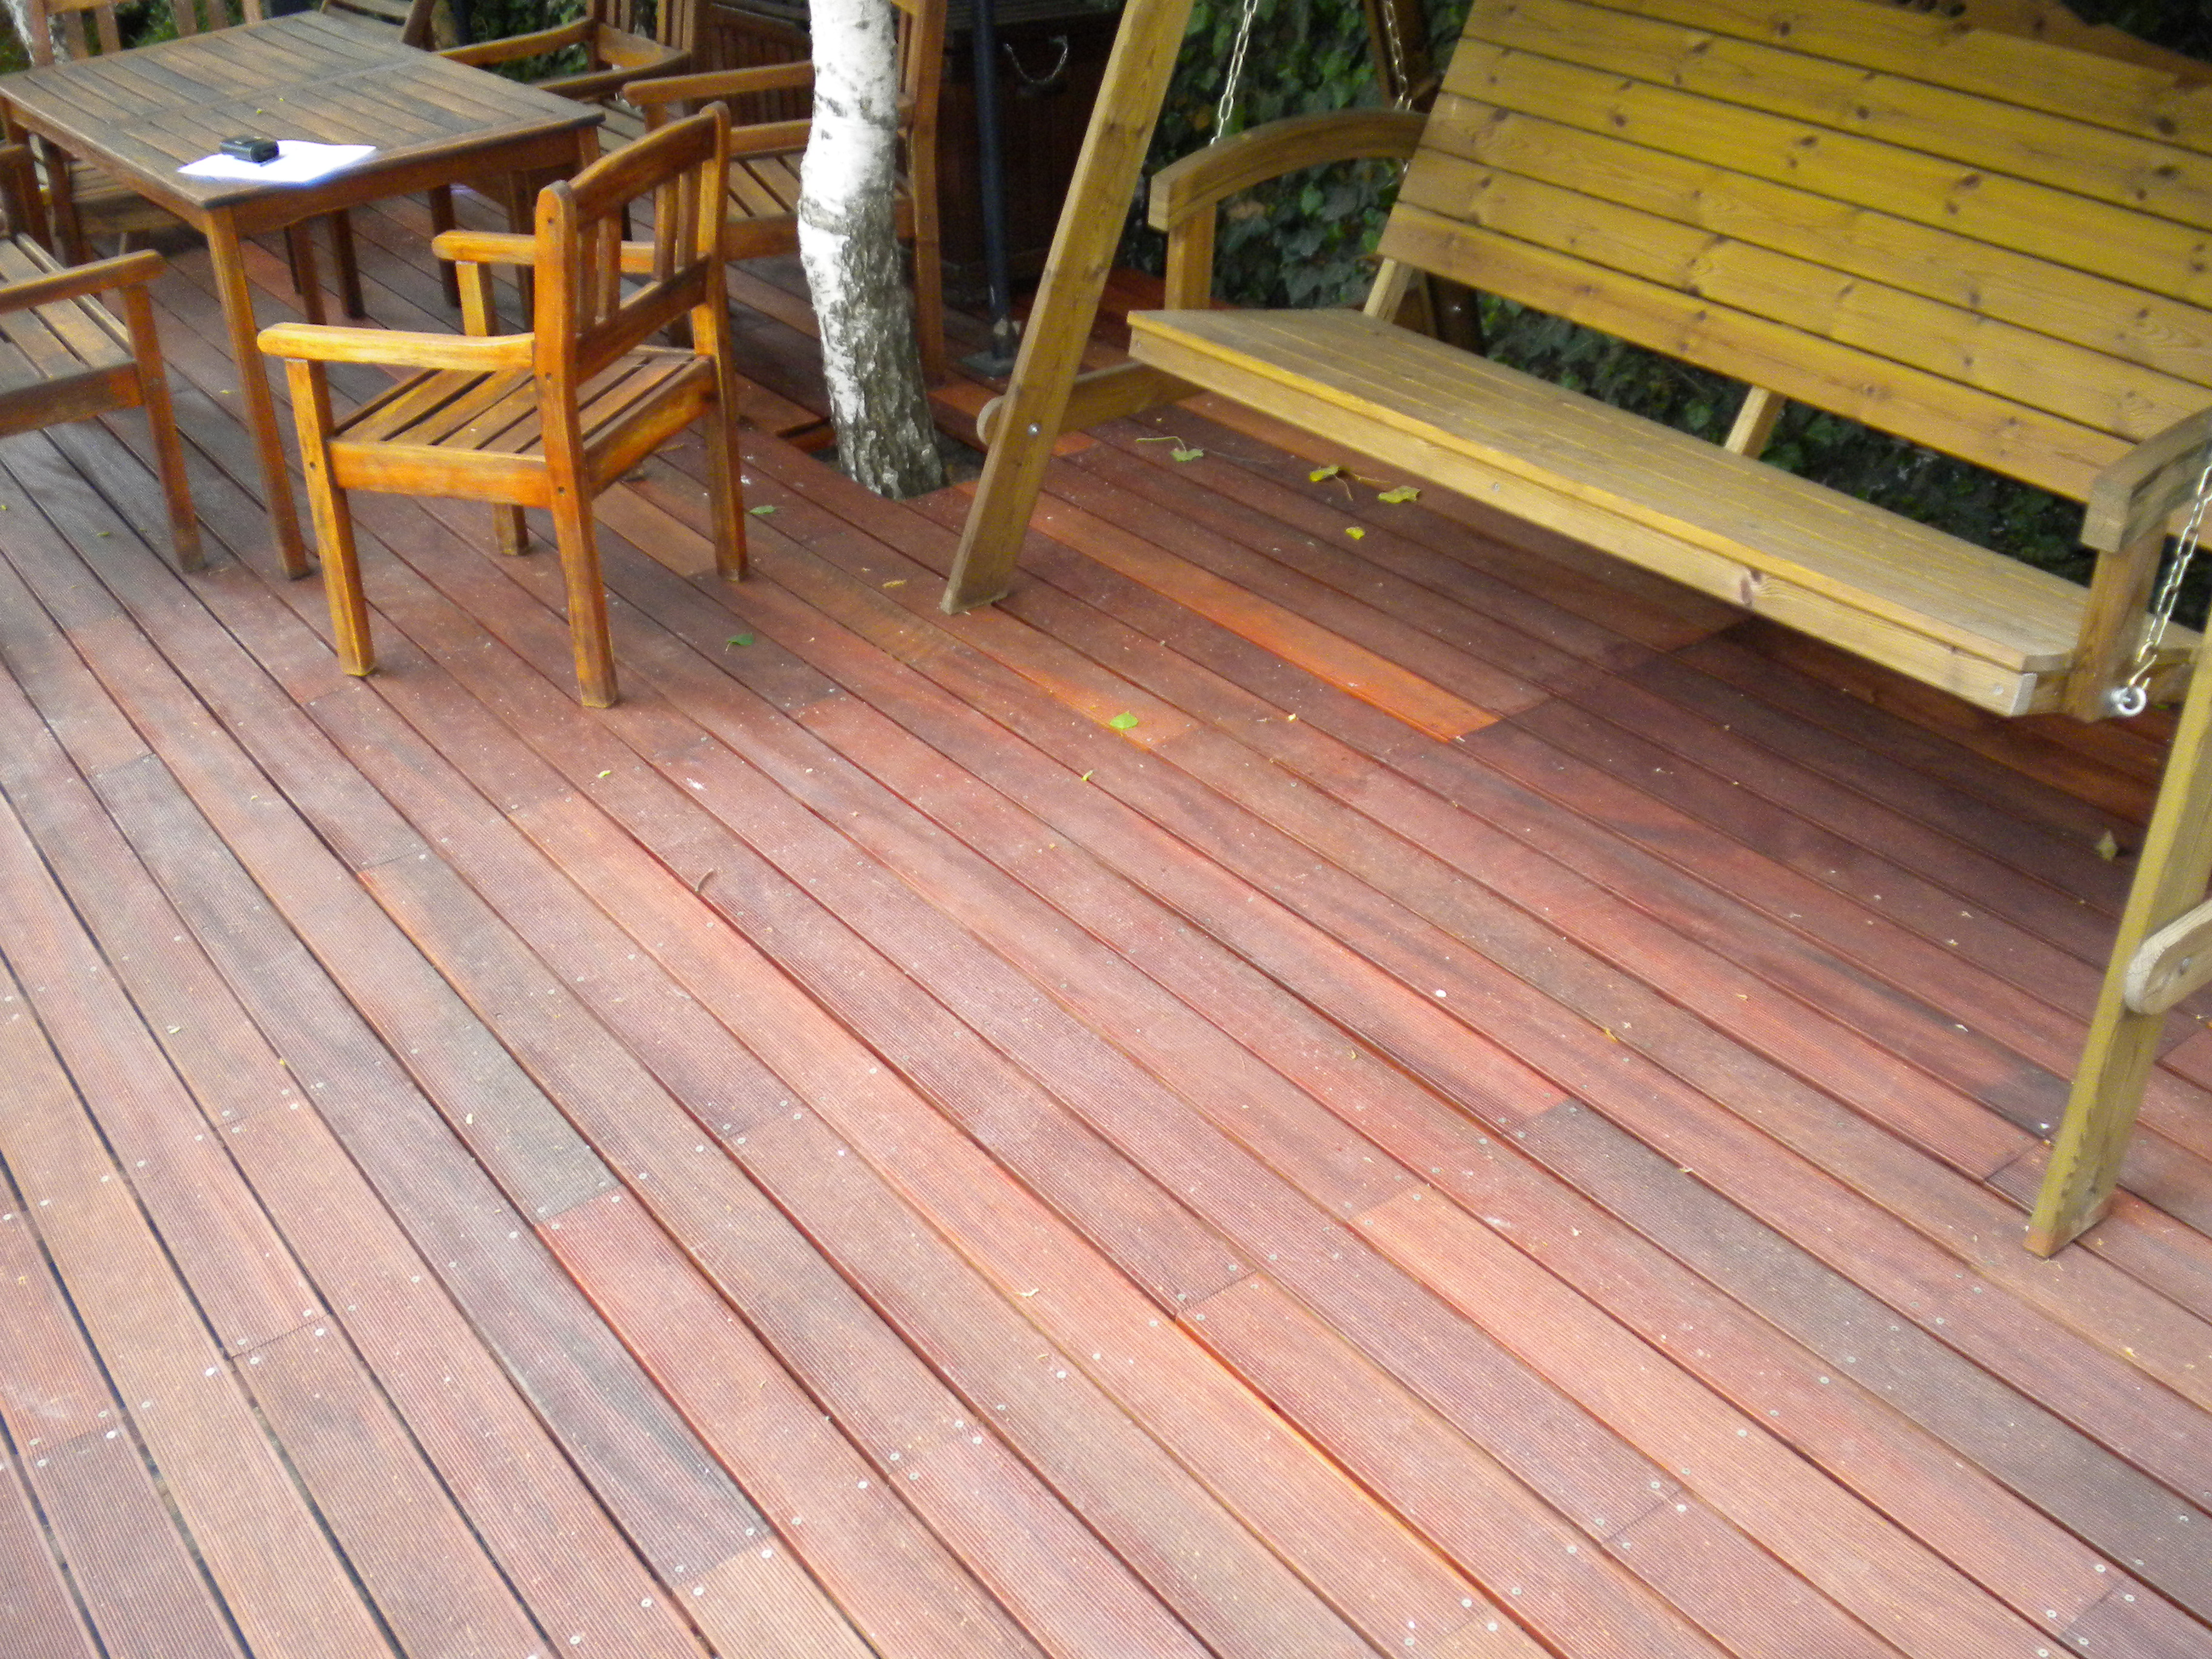 Deck-uri lemn - Uxi SELVA FLOORS - Poza 5